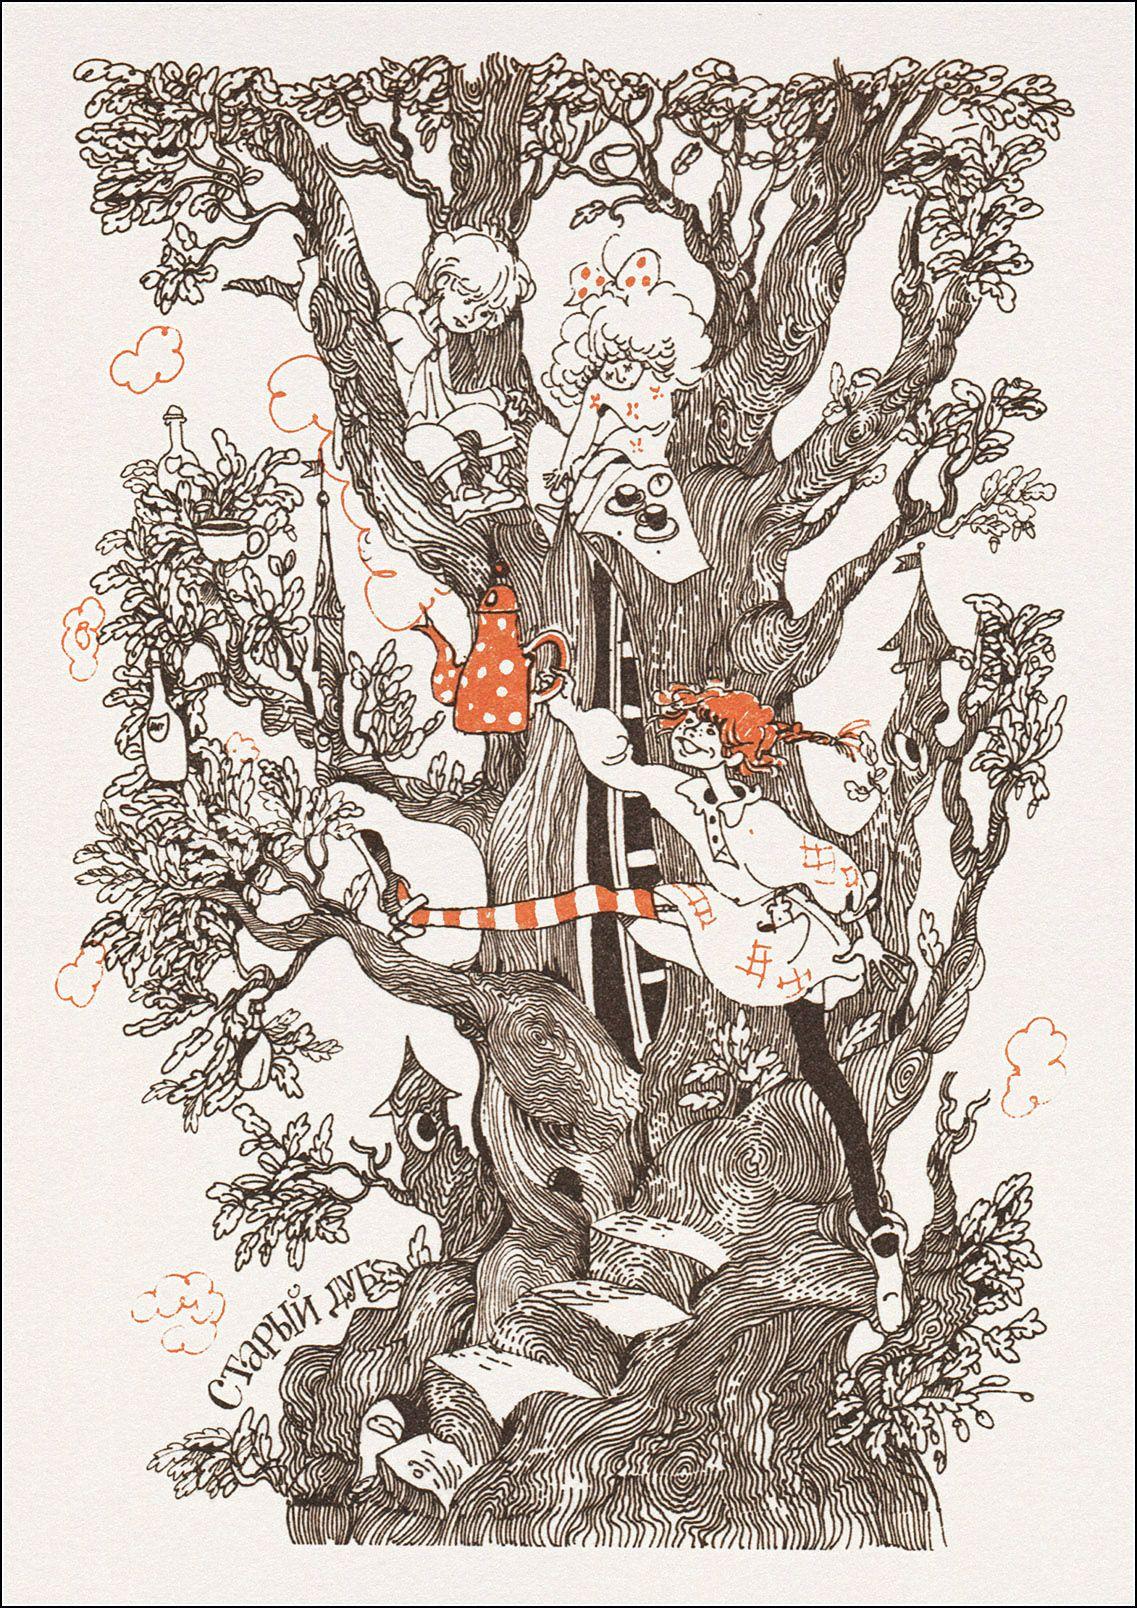 astrid lindgren illustration